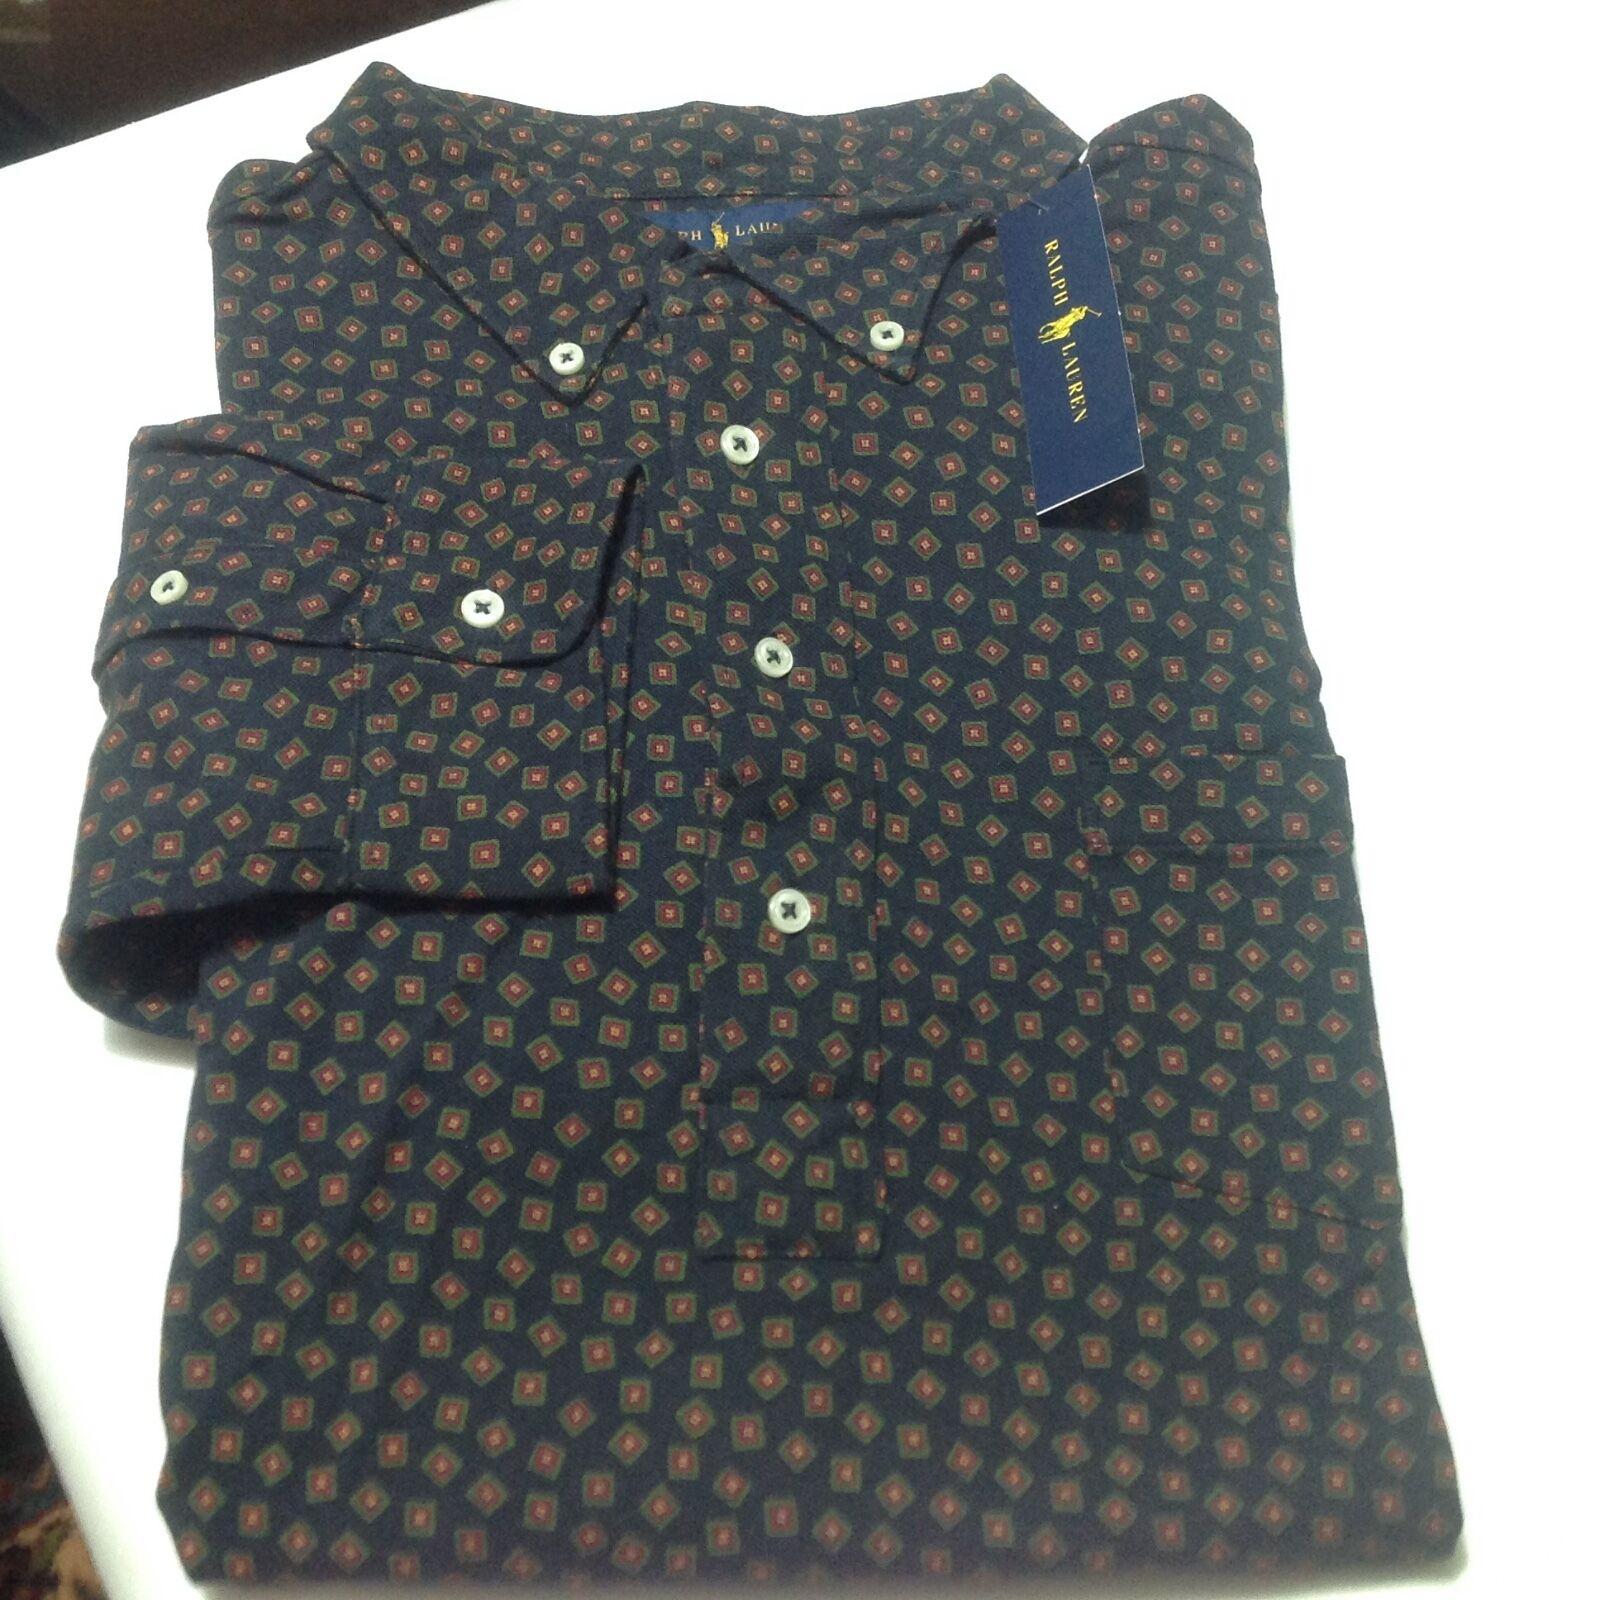 Polo Ralph Lauren Men Big And Tall Printed Popover Shirt Top 2LT Navy bluee